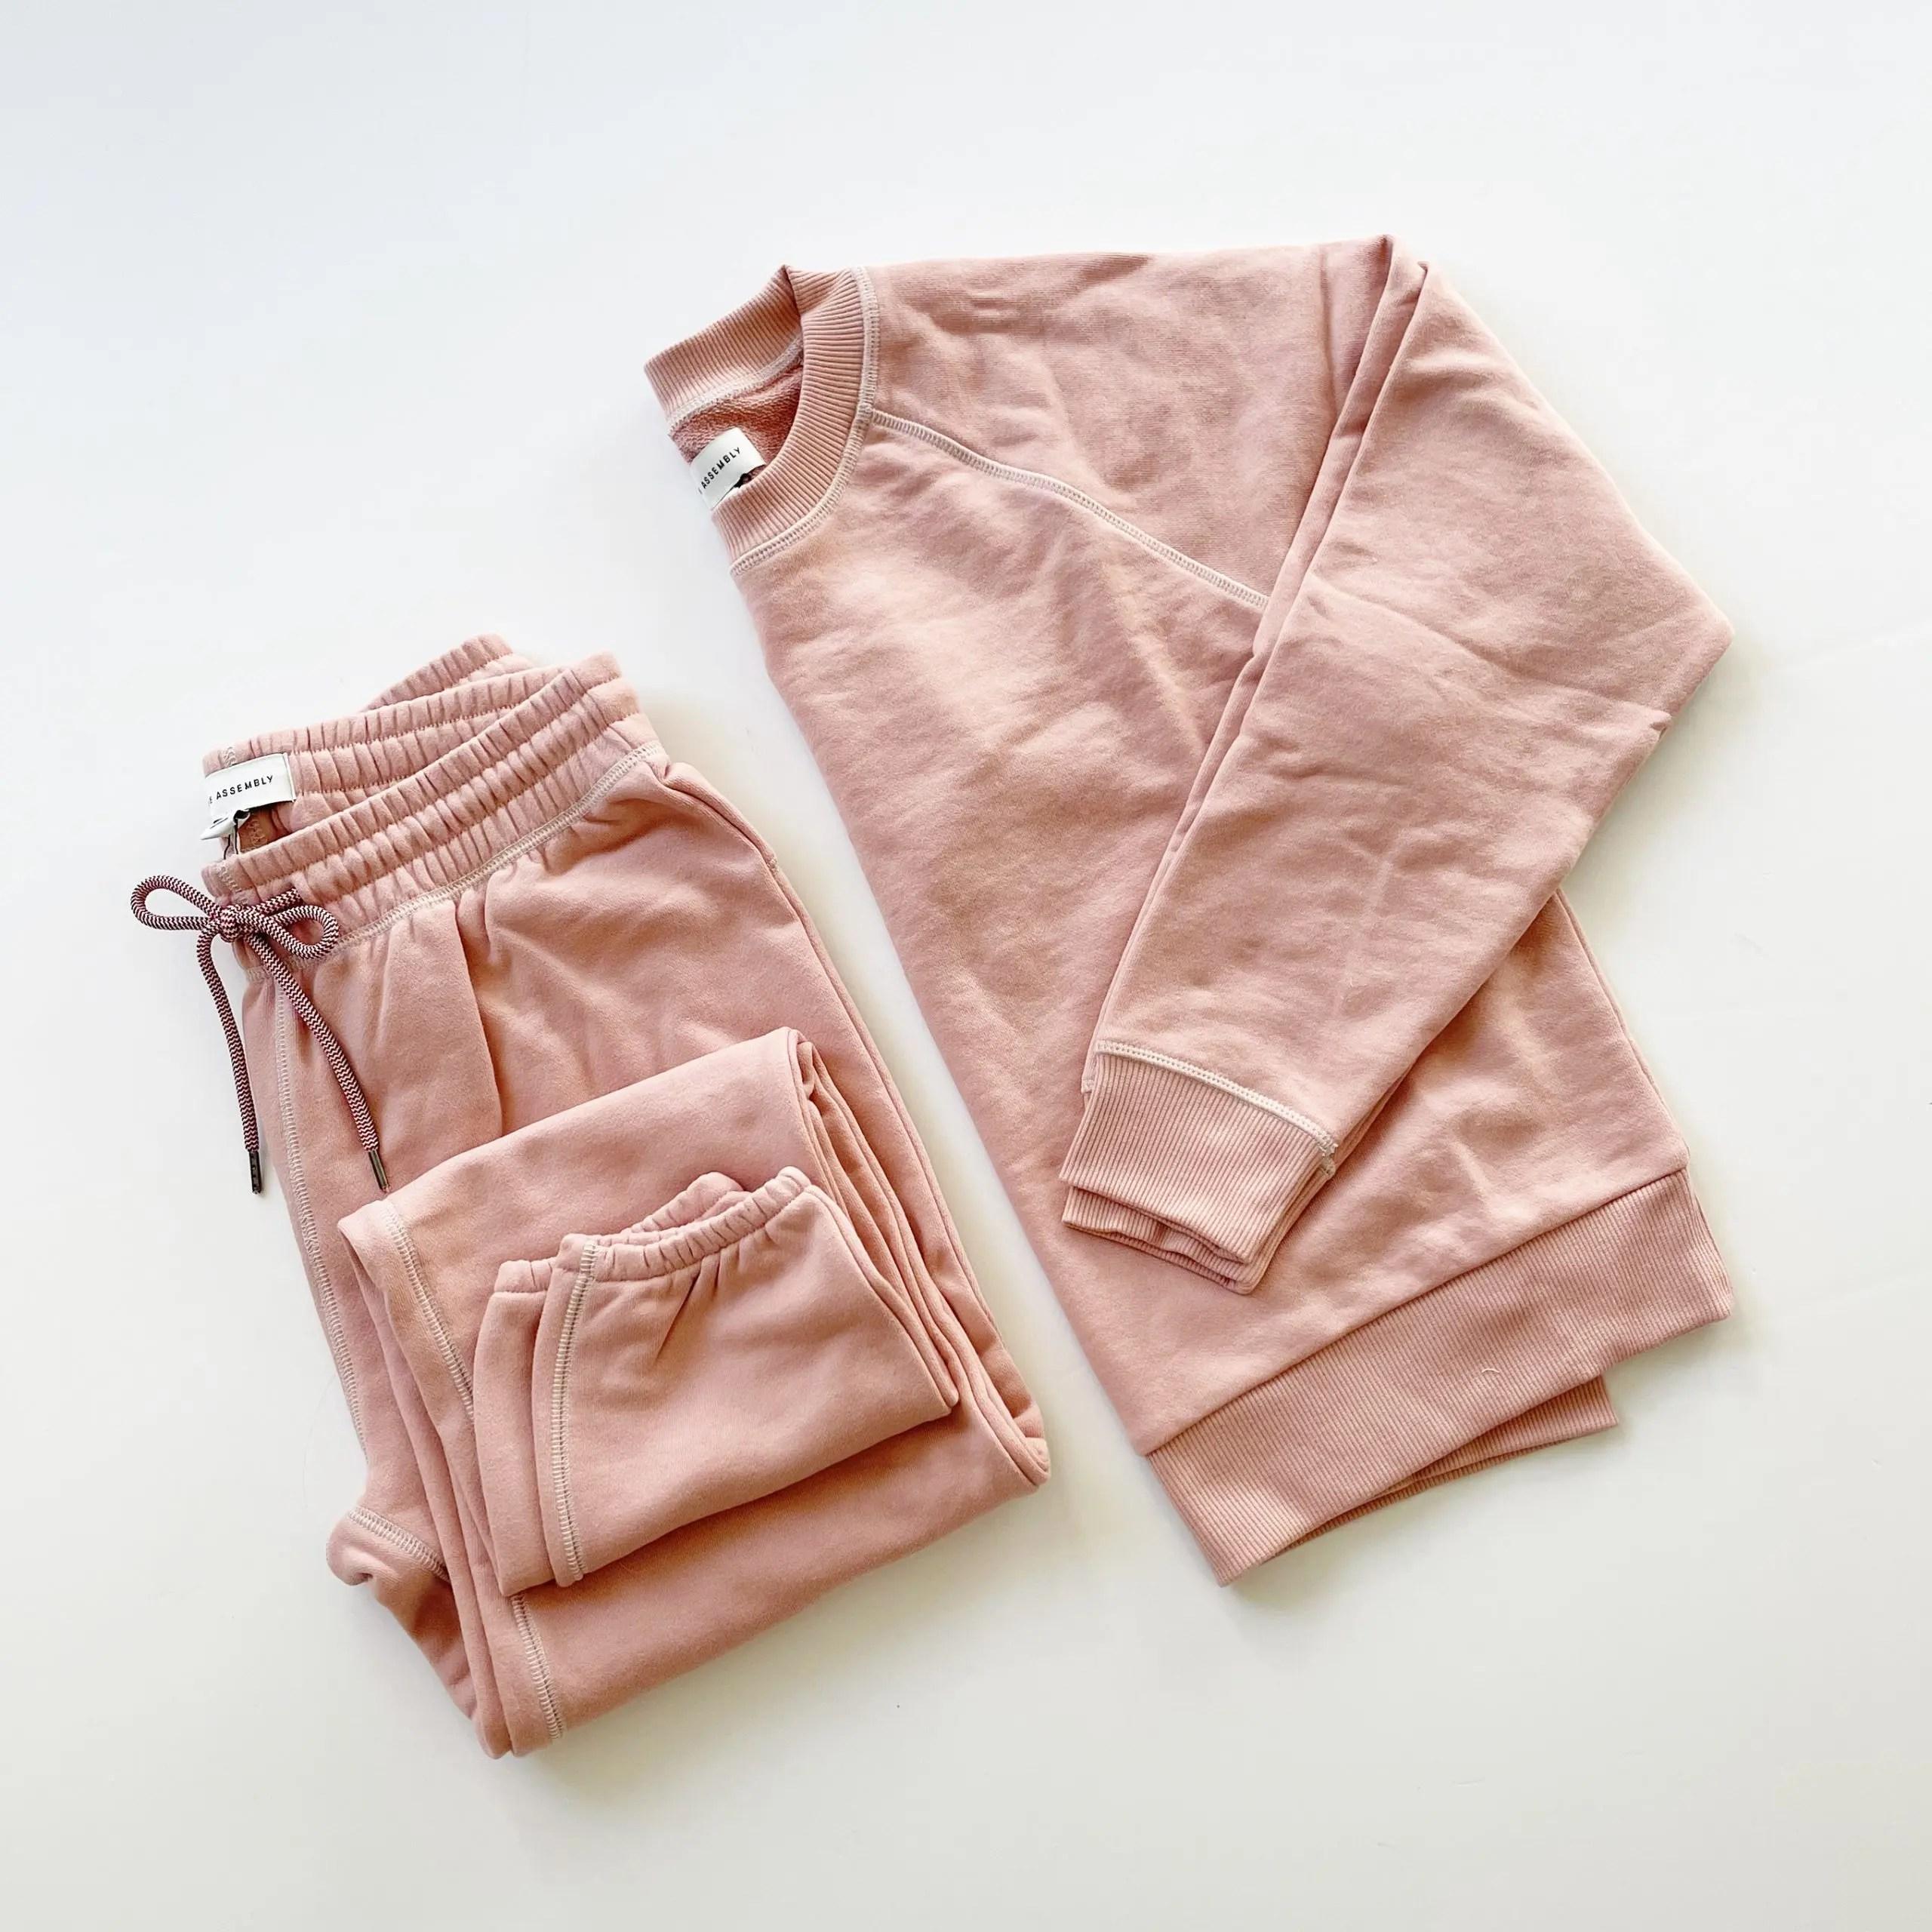 Free Assembly Classic Sweatshirt and Sweatpants